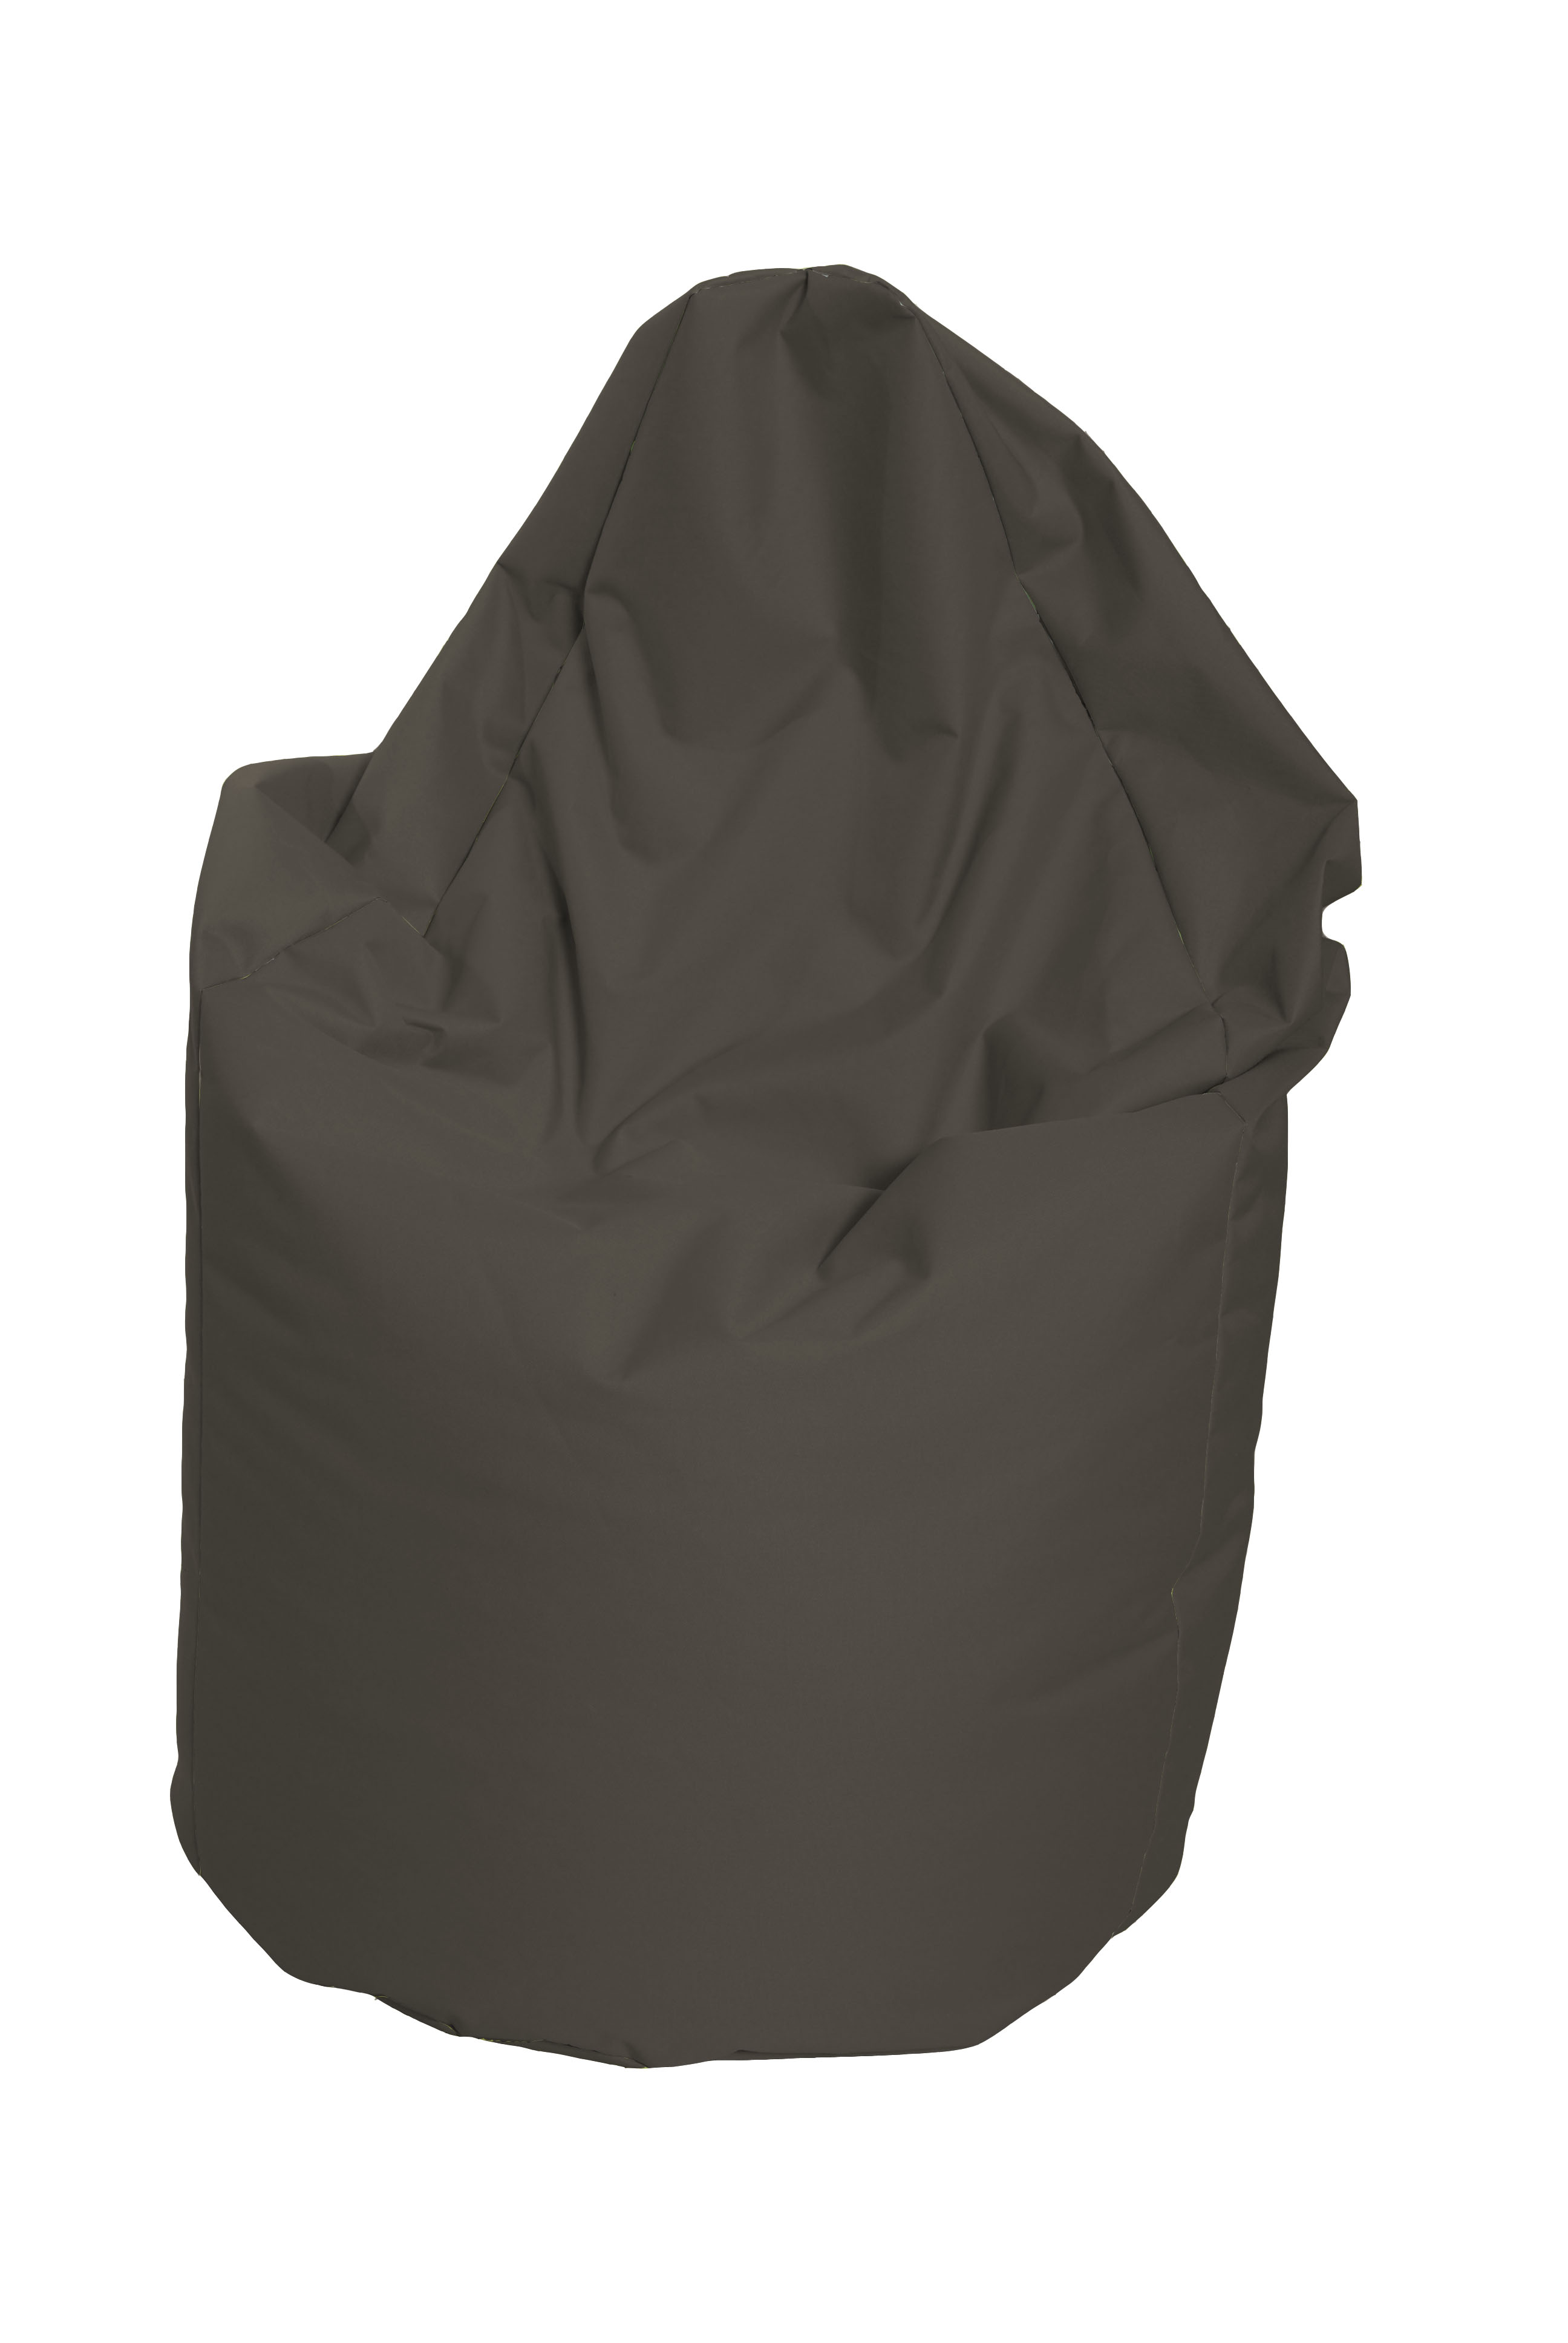 Sedací vak hruška Mega tmavě šedá (tmavě šedá 80048)